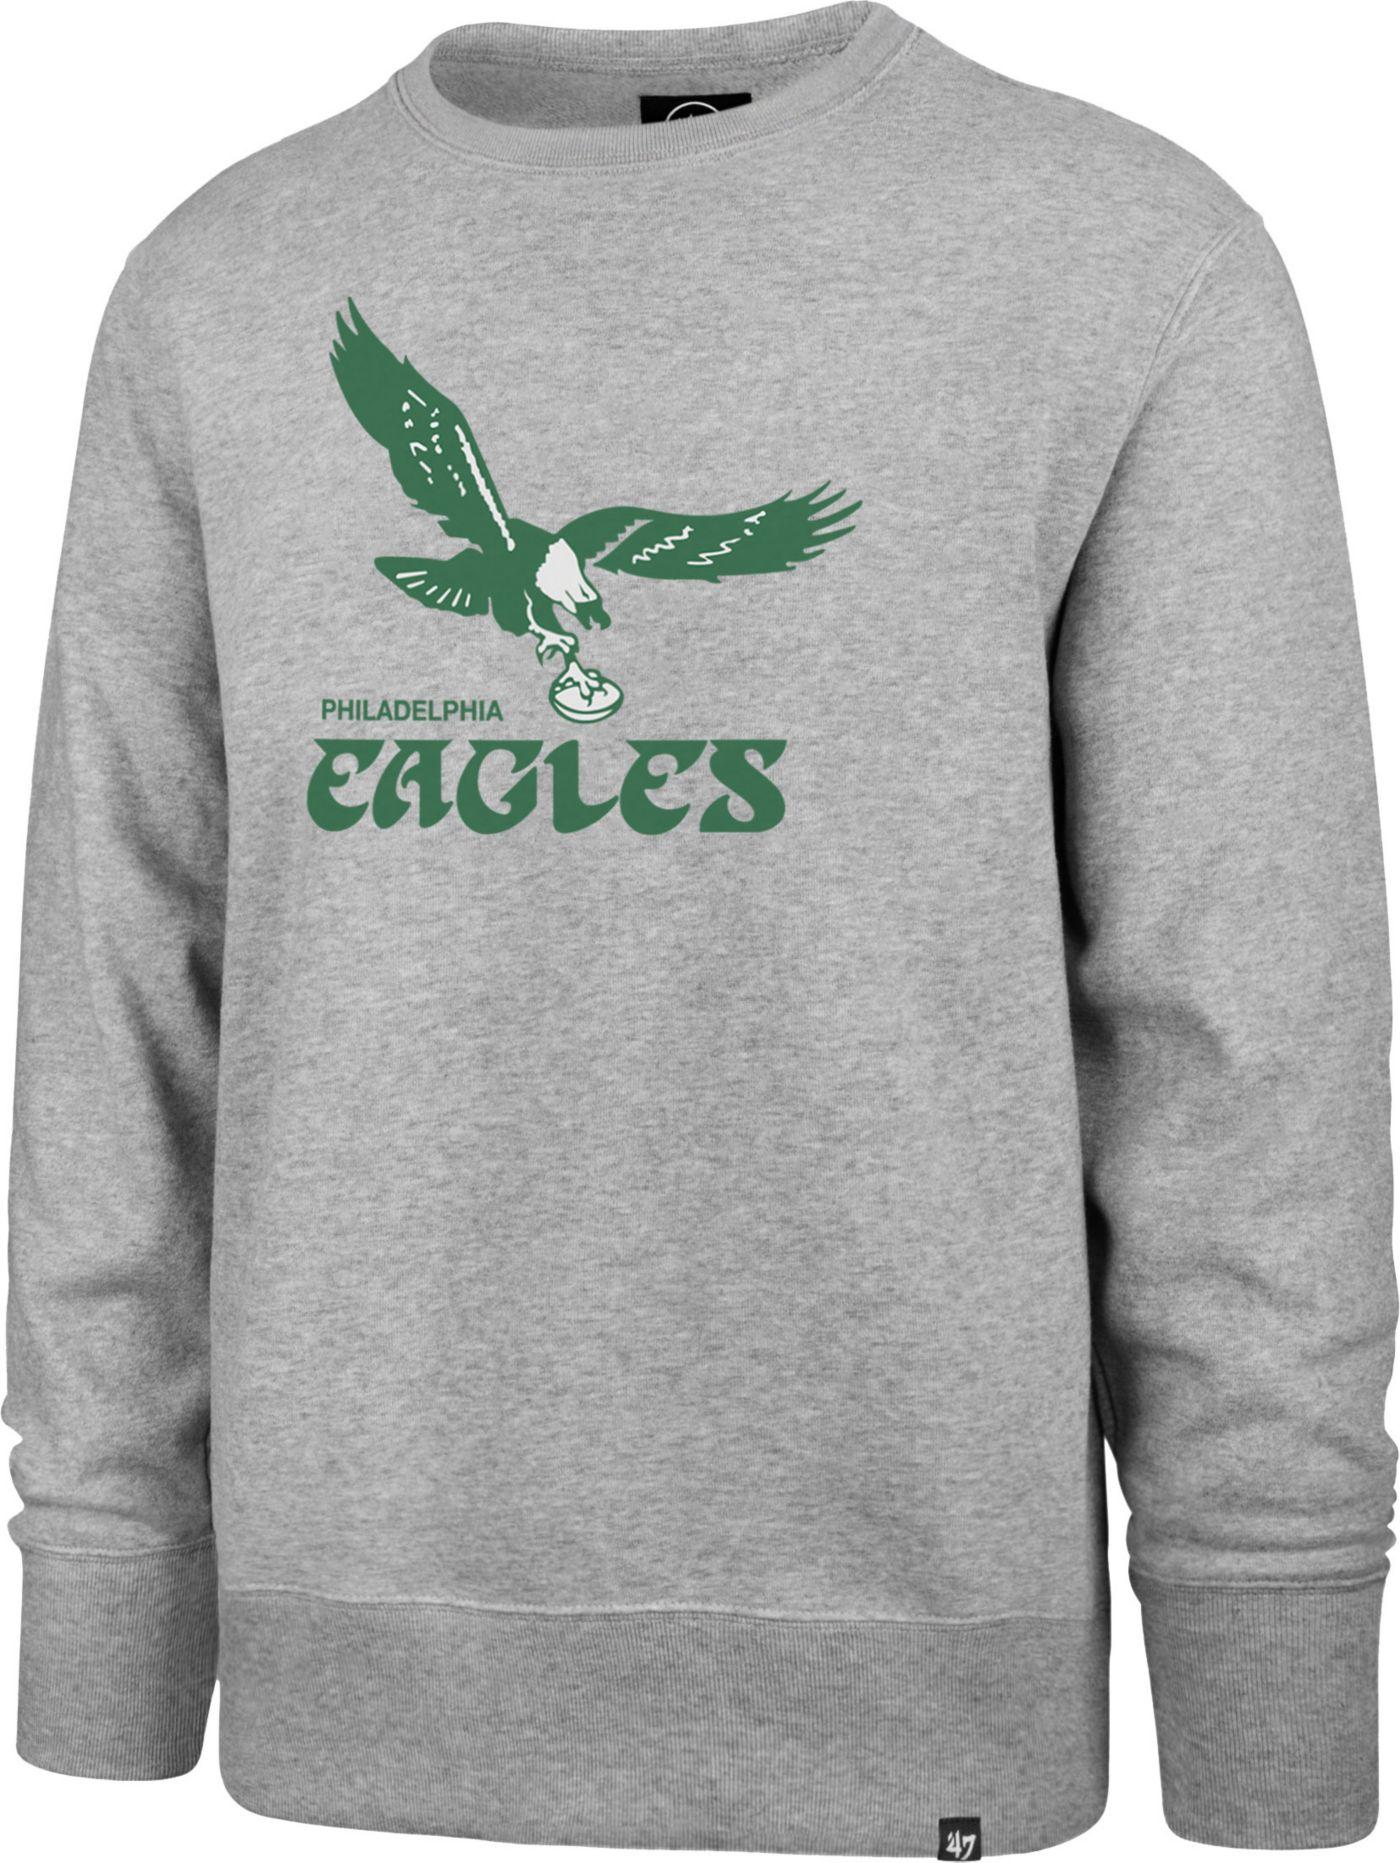 '47 Men's Philadelphia Eagles Legacy Headline Grey Crew Sweatshirt